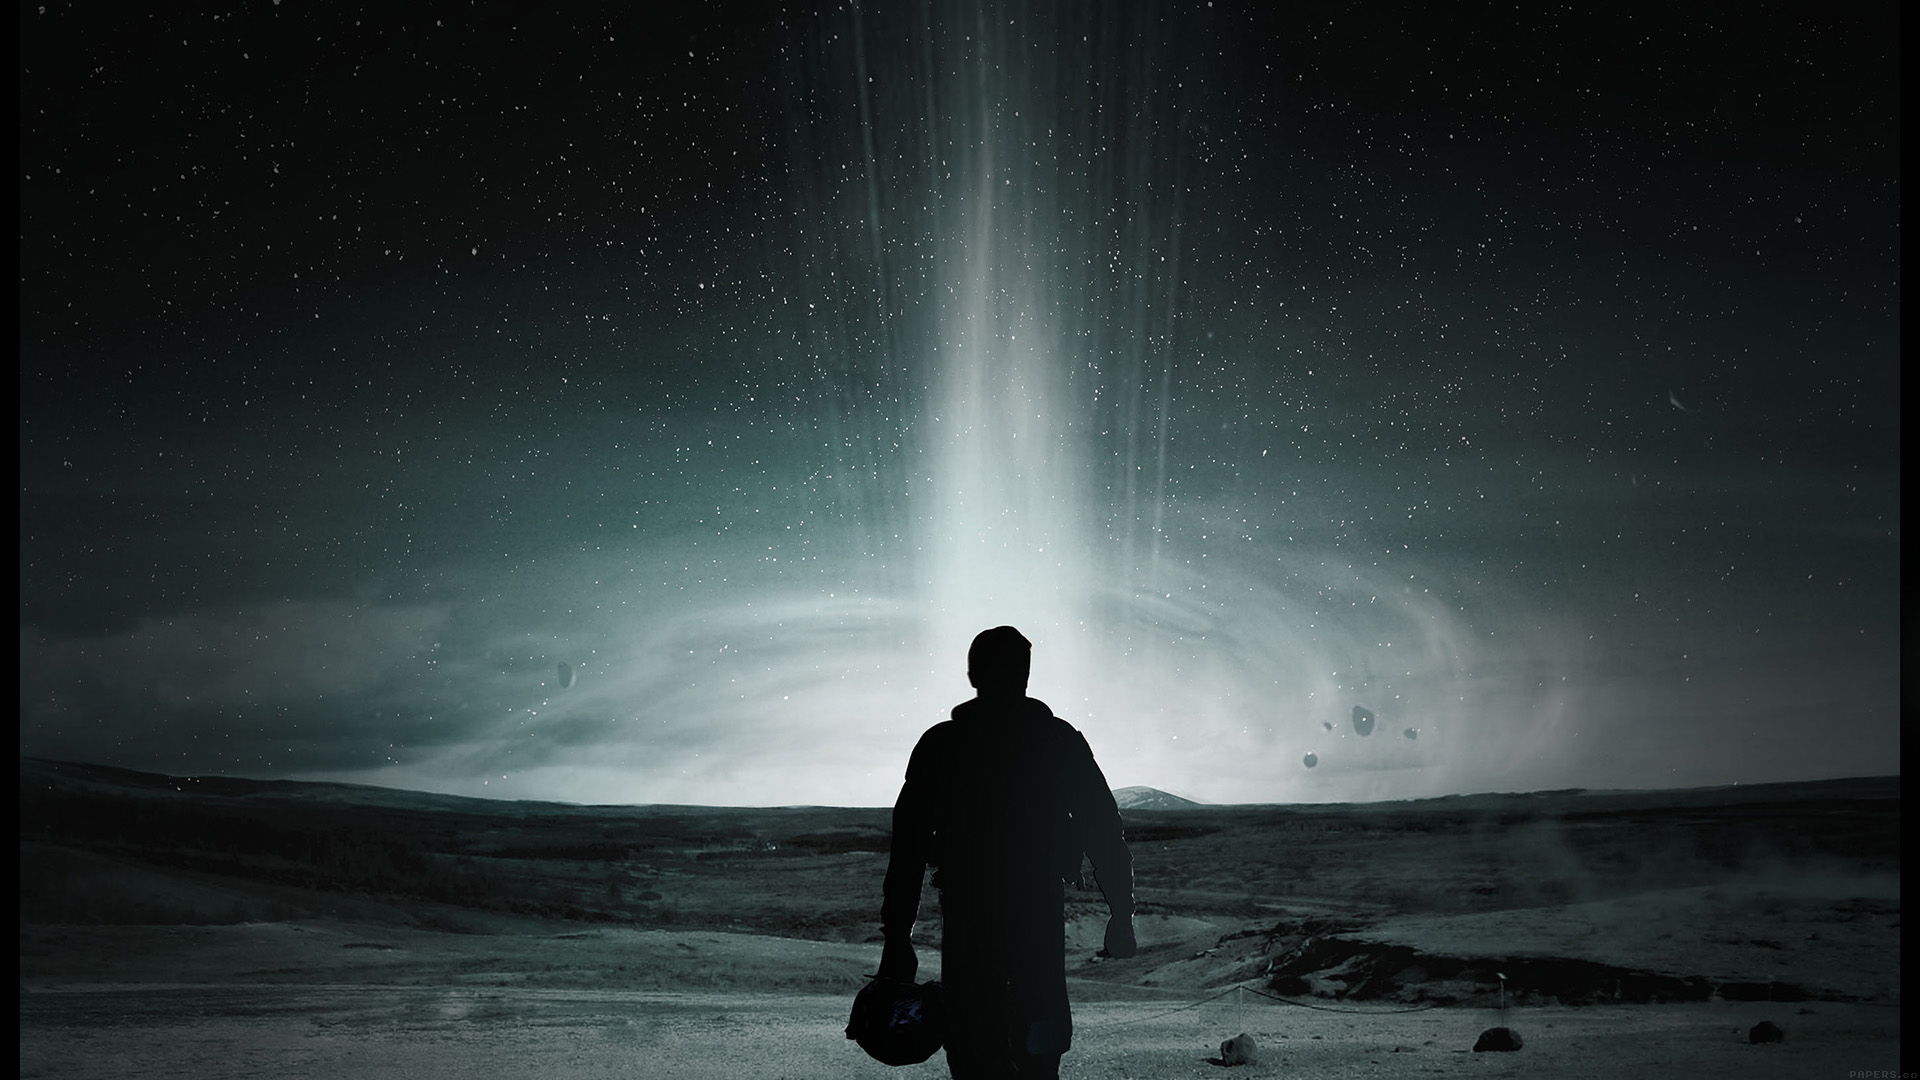 Fall Sunset Anime Wallpaper Hc86 Matthew Mcconaughey Interstellar Space Filme Papers Co